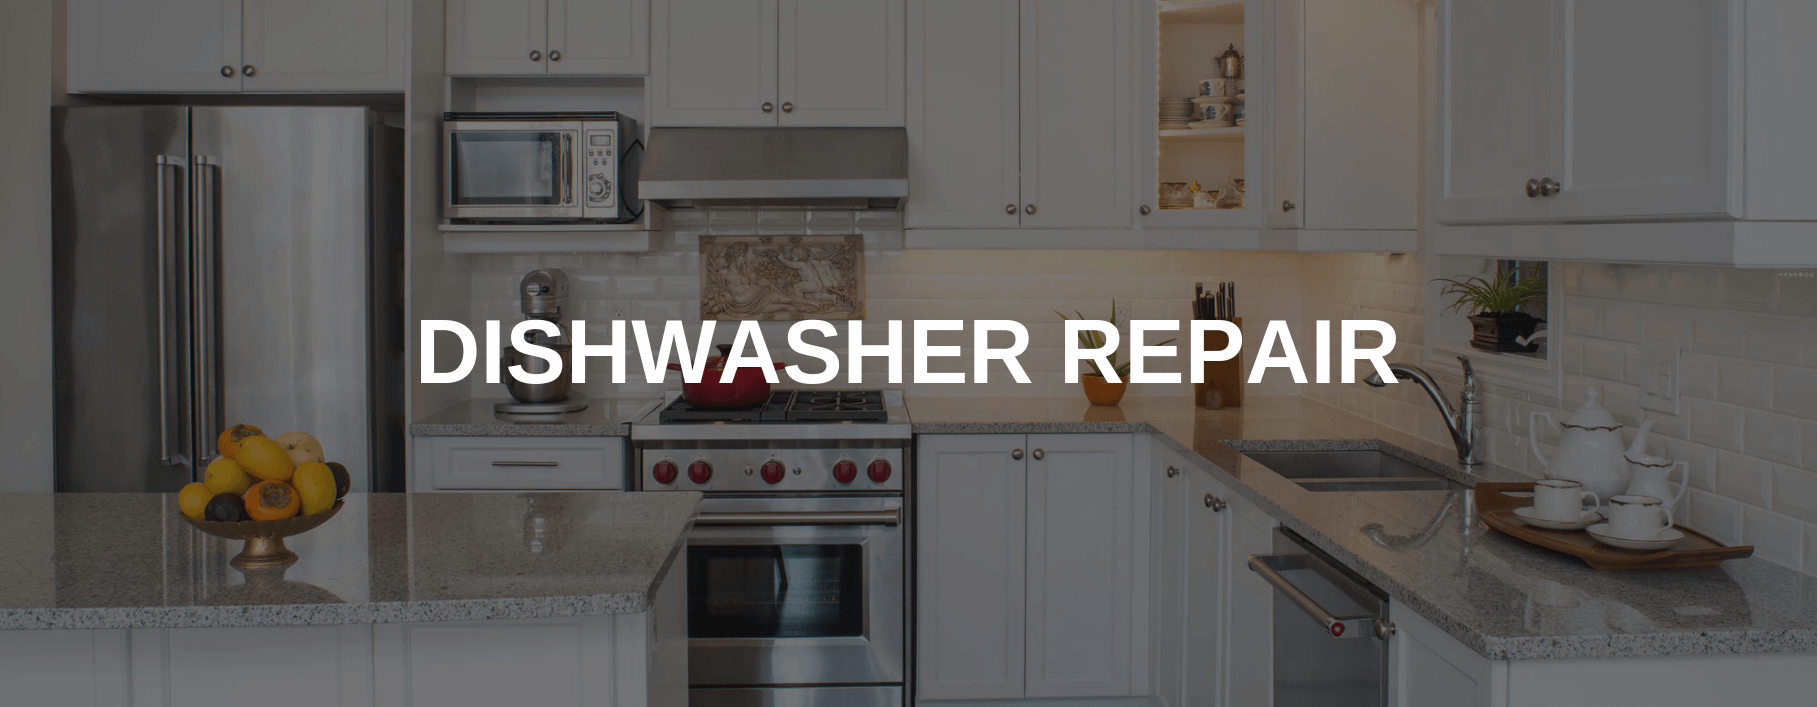 dishwasher repair new britain